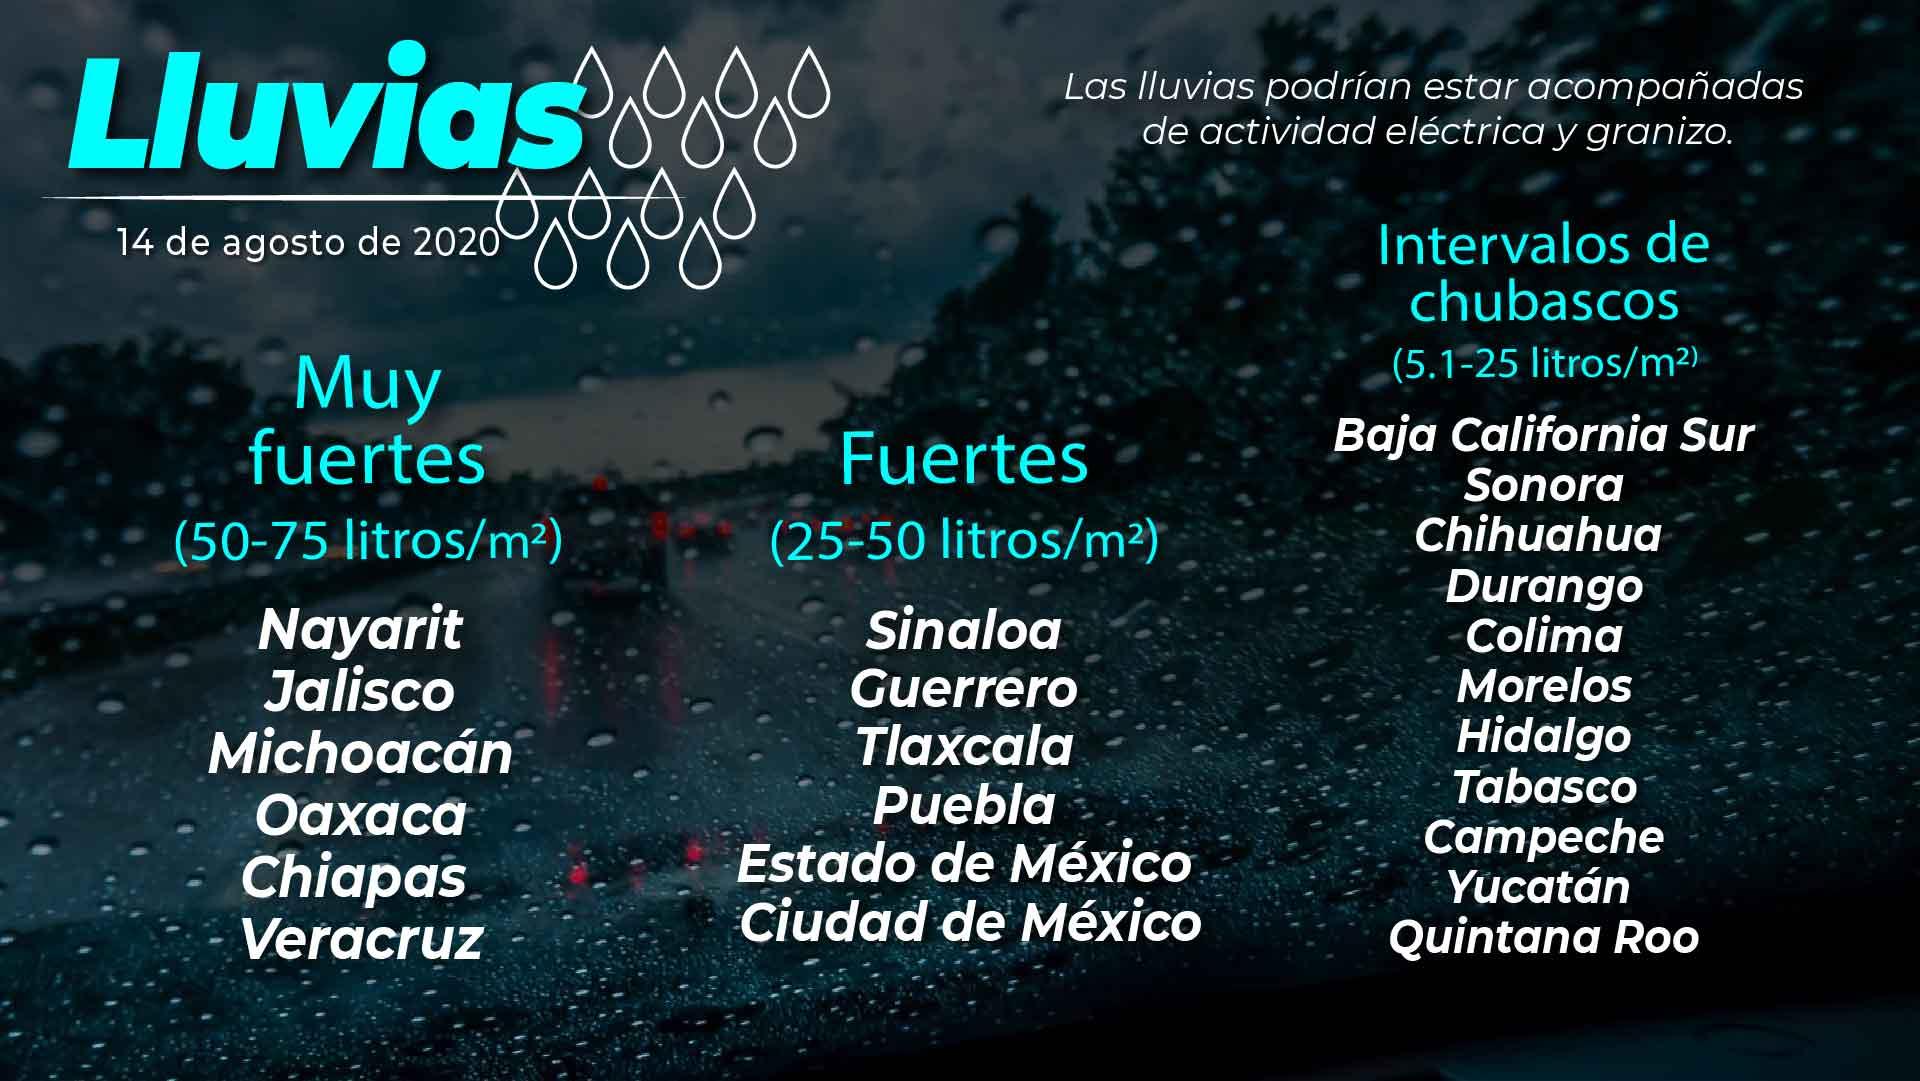 Lluvias fuertes se prevén para Tlaxcala el dia de hoy